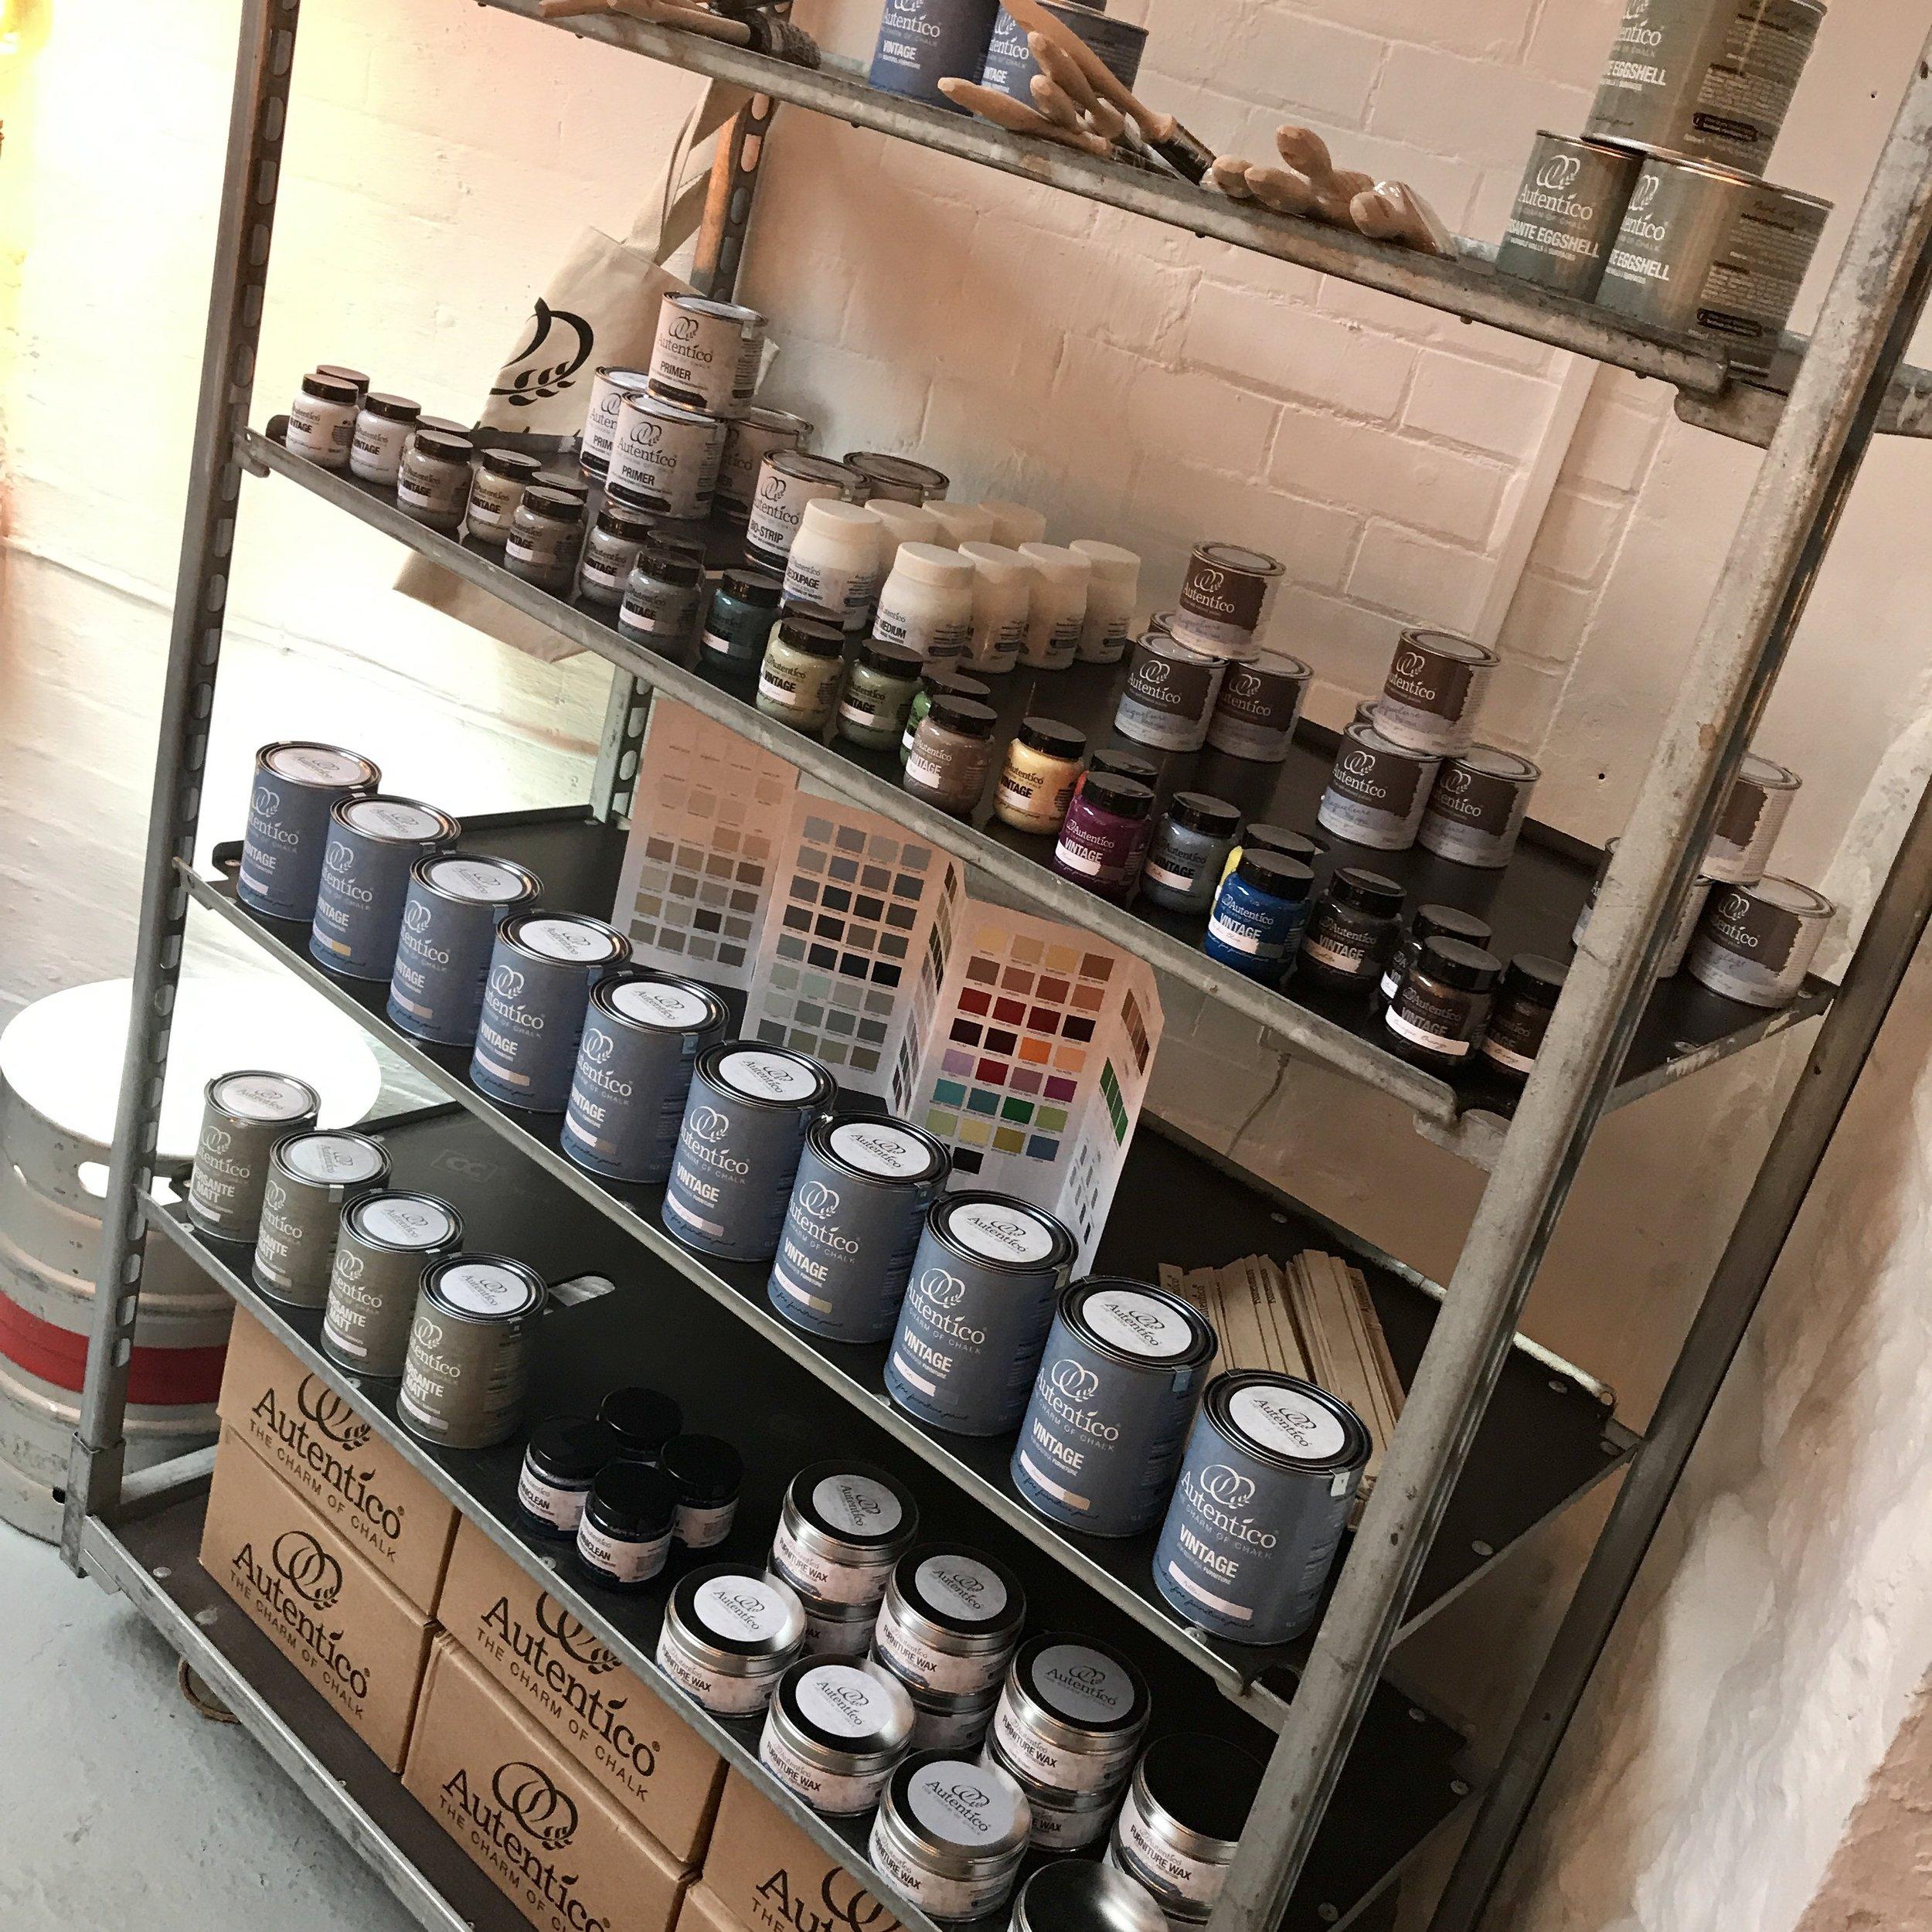 Autentico Paint Stockist - Derbyshire #thecharmofchalk